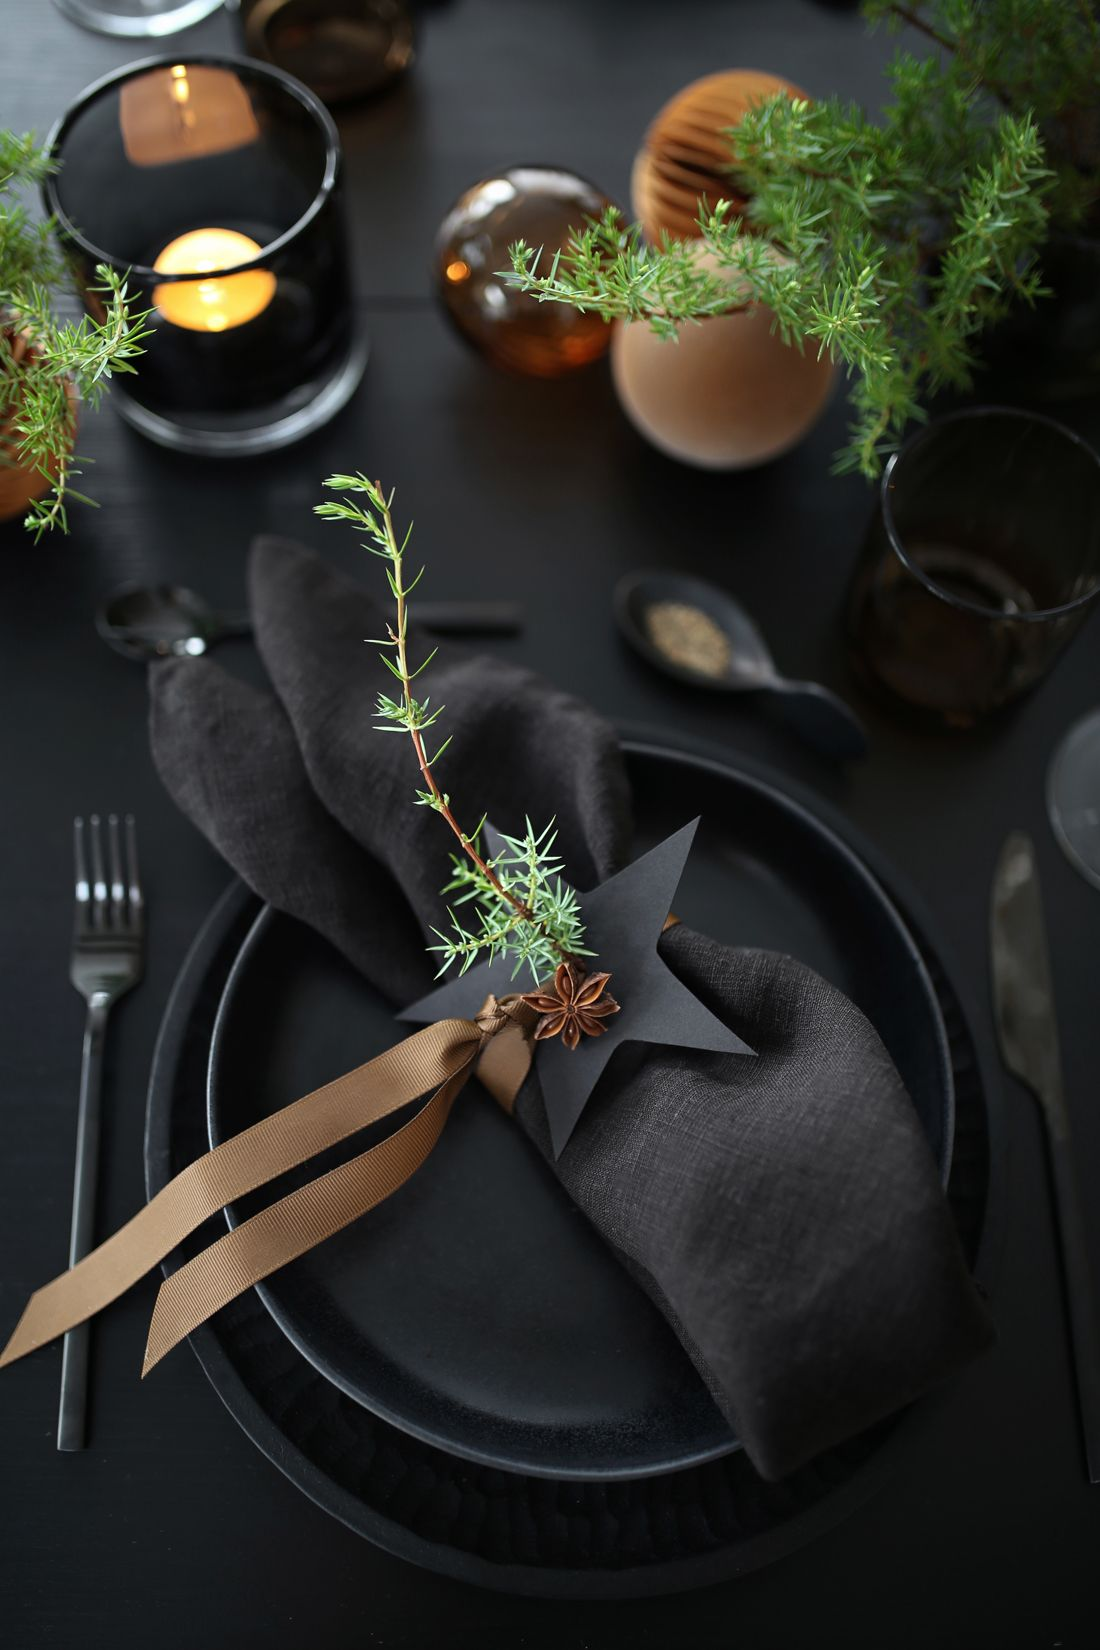 DARK CHRISTMAS TABLE SETTING - Therese Knutsen #borddekkingnyttårsaften